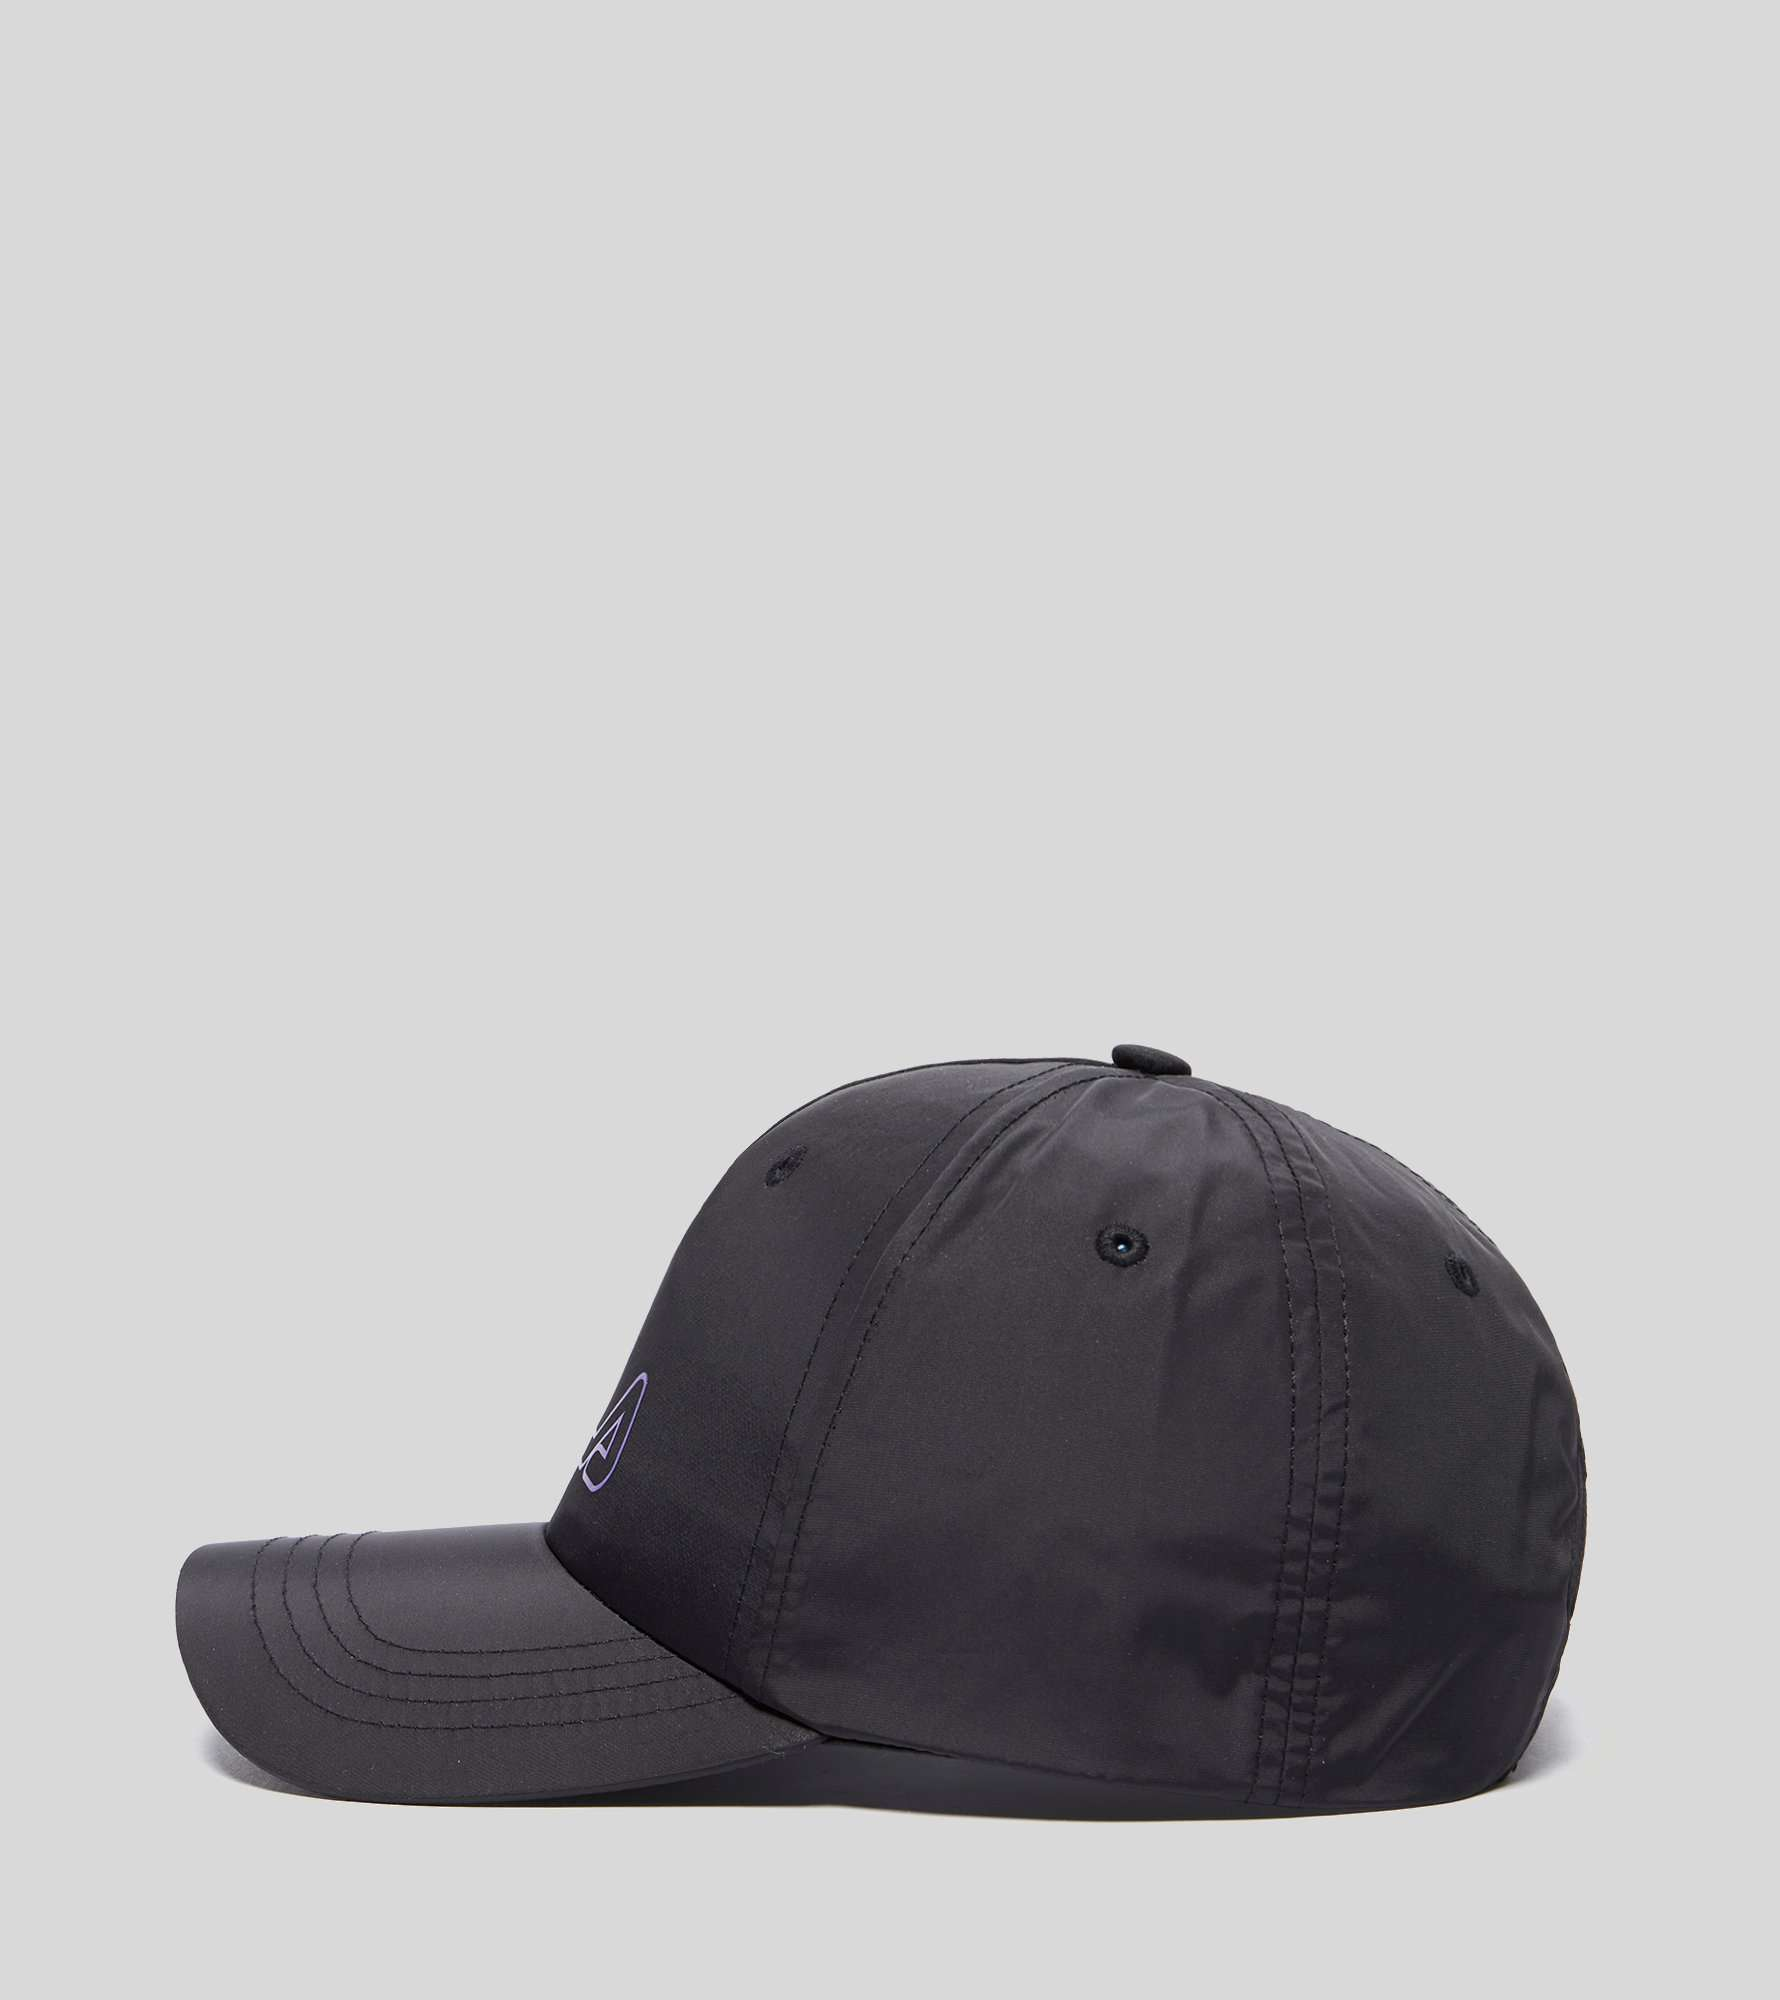 Fila Capo Baseball Cap - size? Exclusive